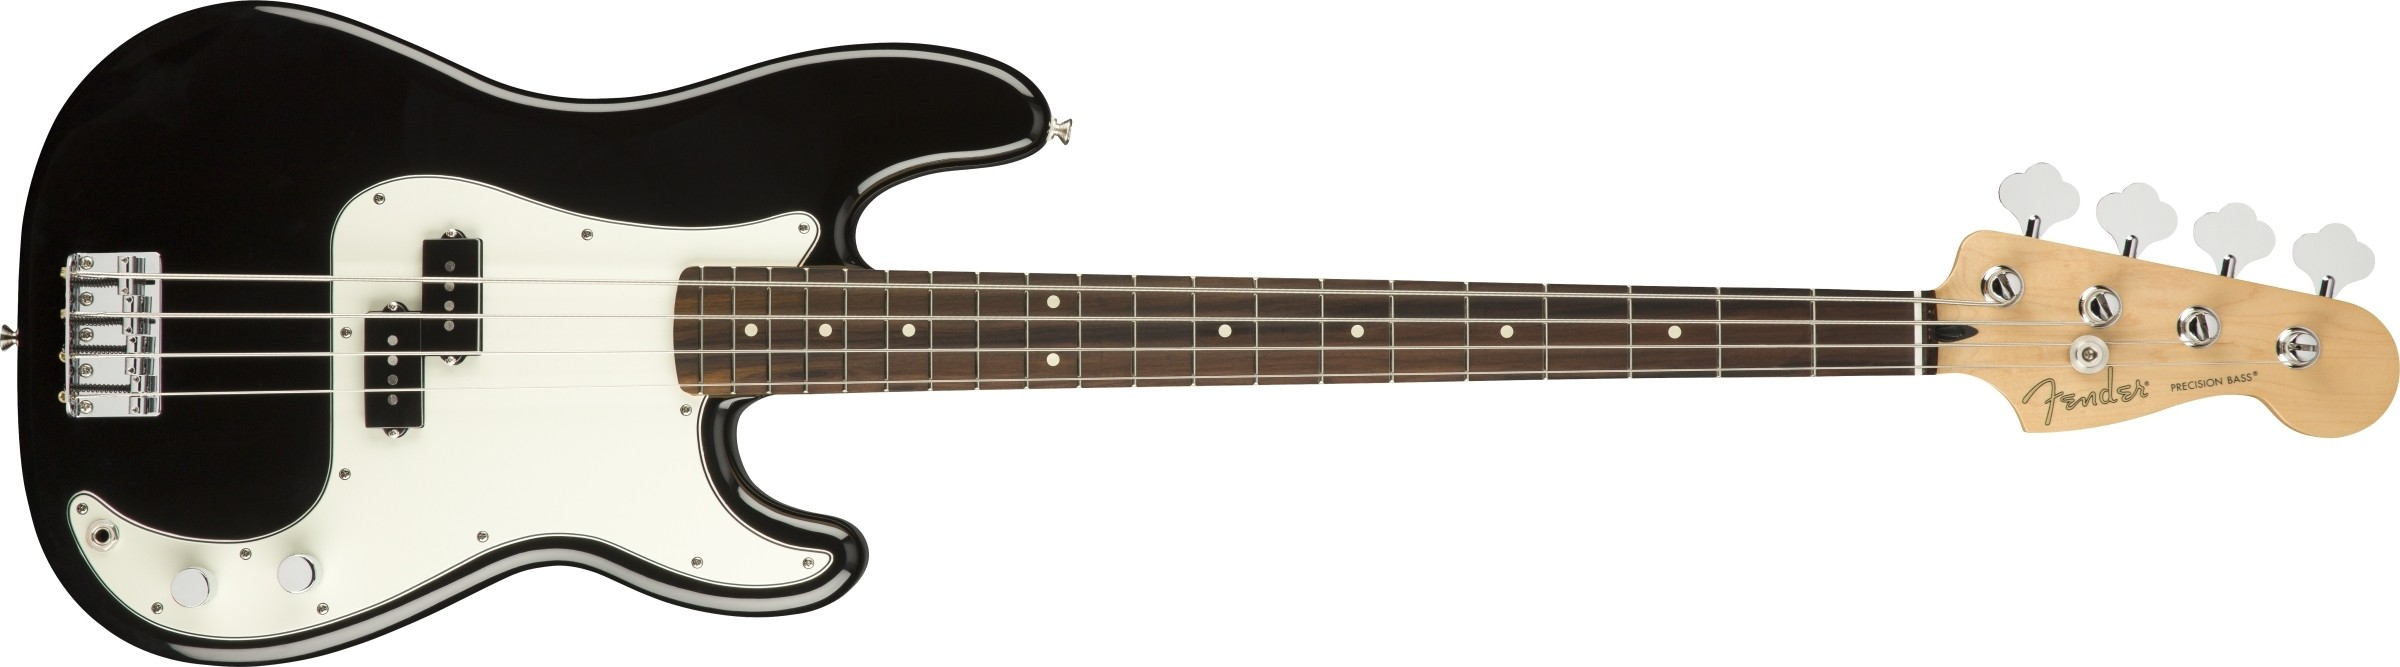 Fender Player Precision Bass - Black - Pau Ferro